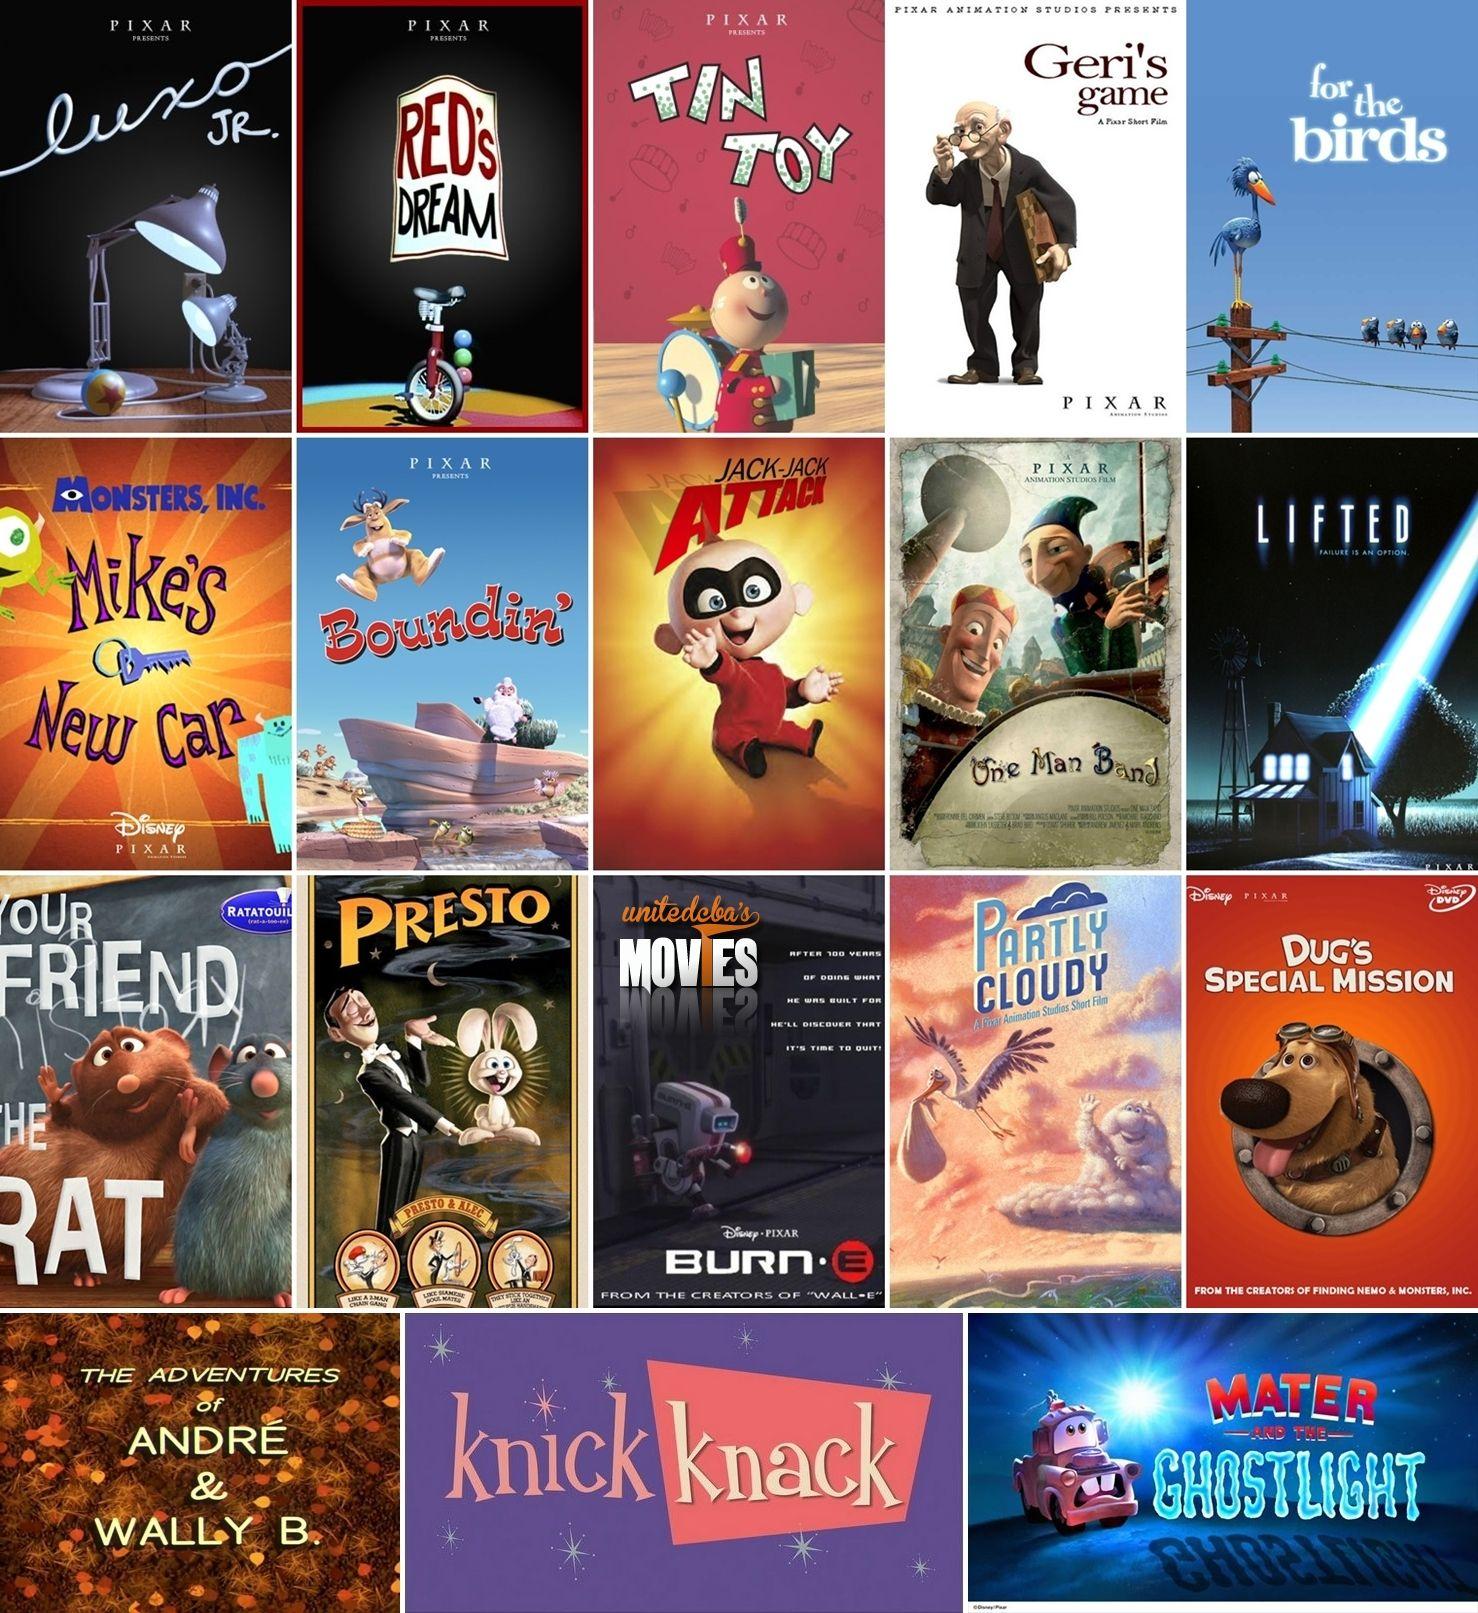 Disney Pixar Shorts Films - Google Search